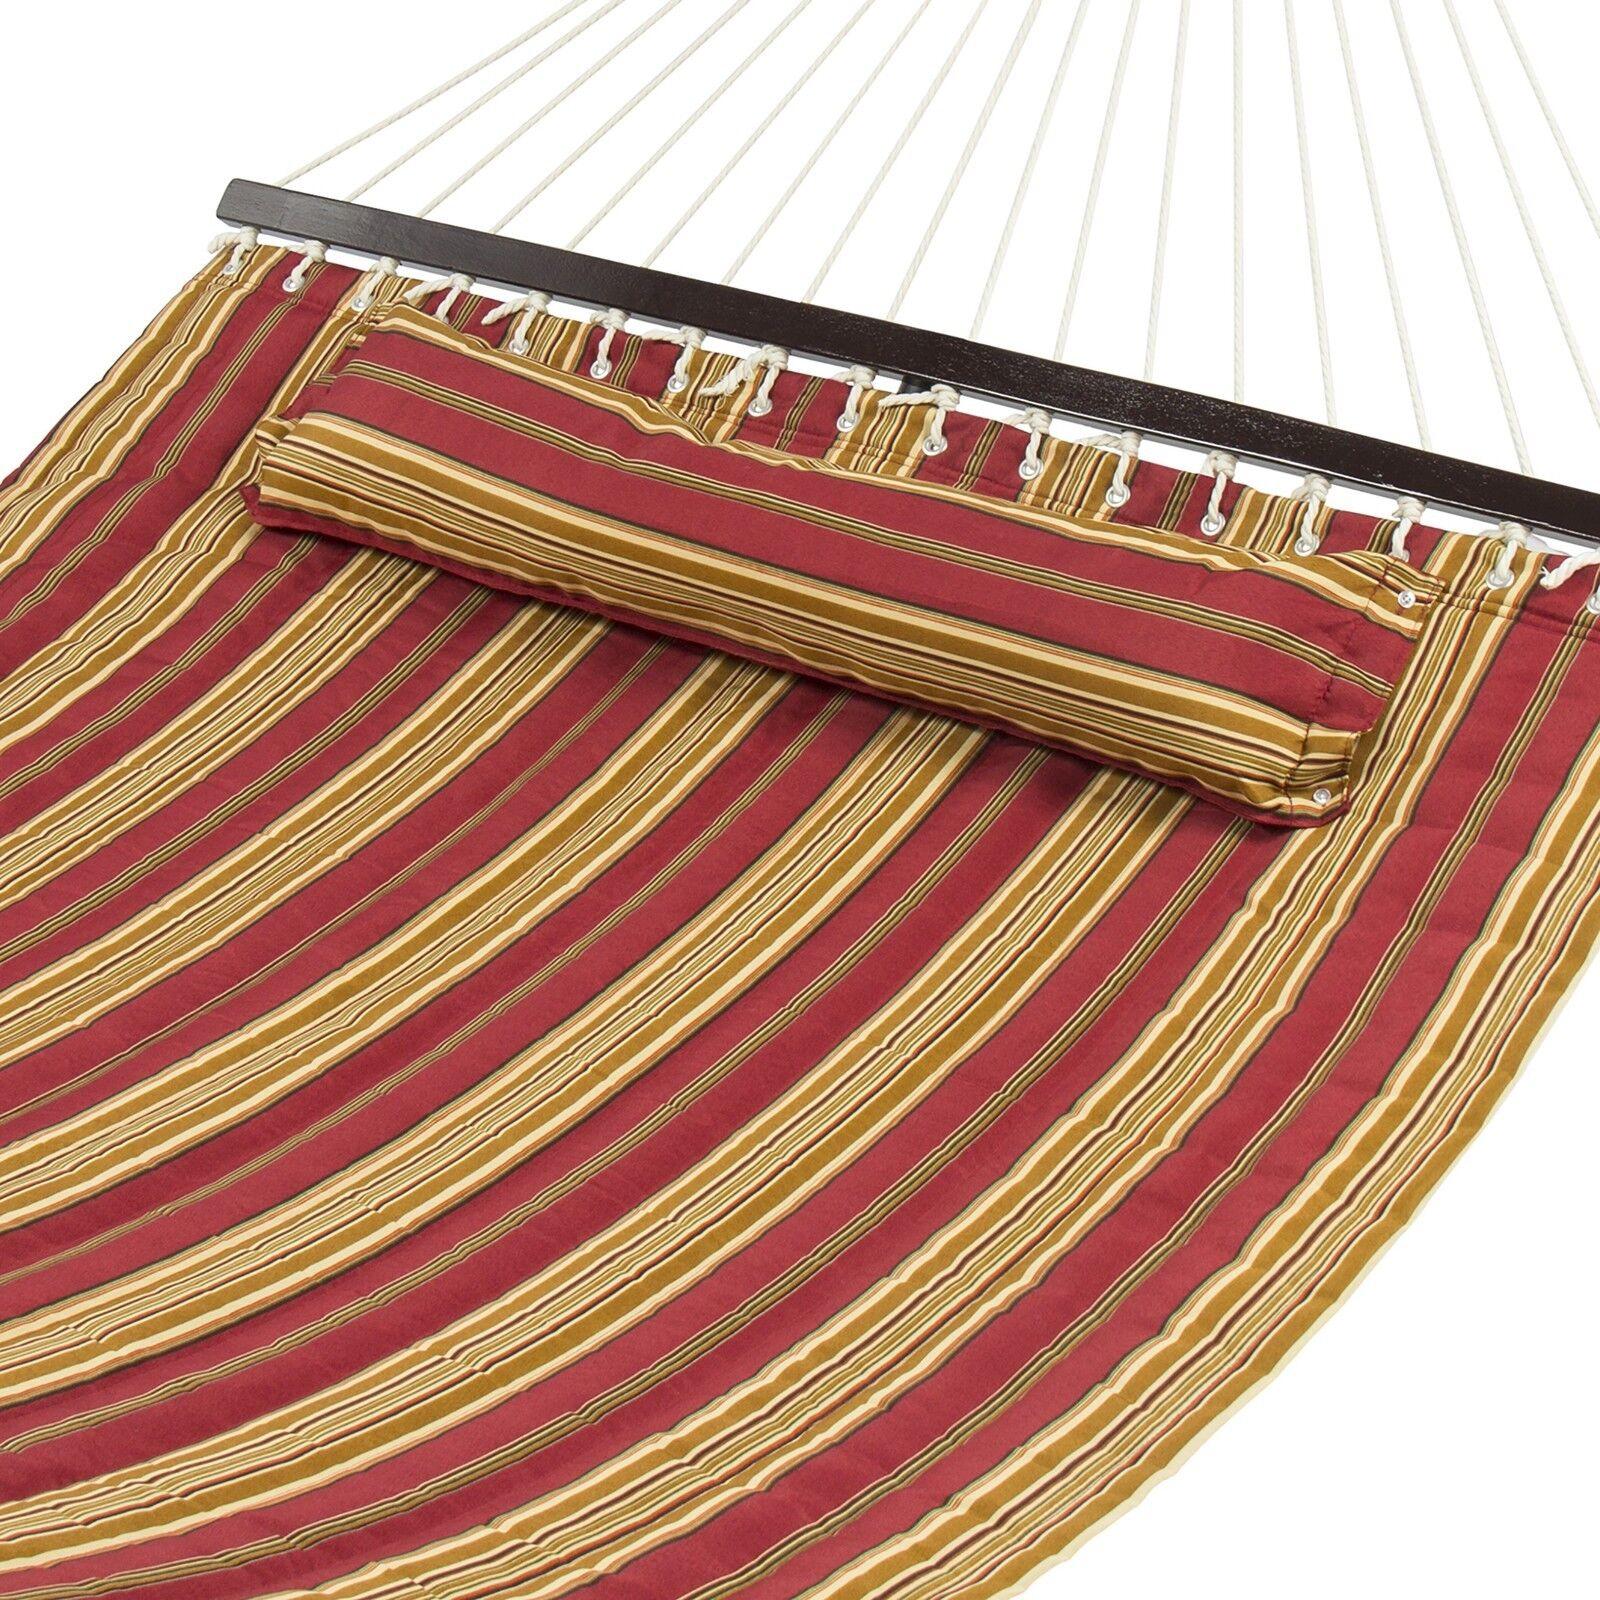 Double Hammock Hammock Hammock 2 Person Backyard Patio Pillow Comfort Sturdy Wood Spreader Bar 4e3891